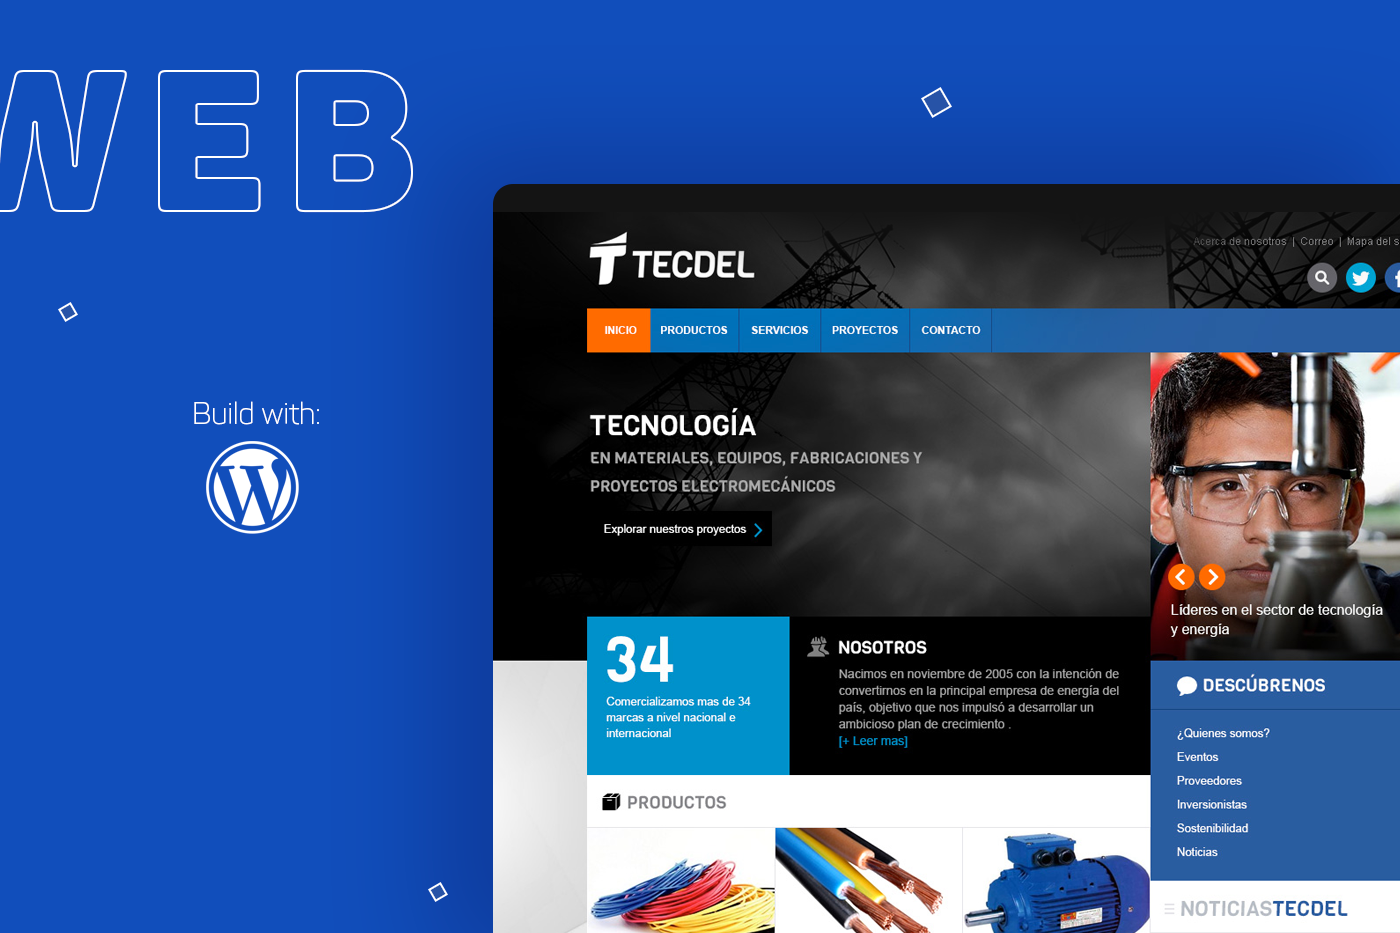 tecdel,Zurvin,Web